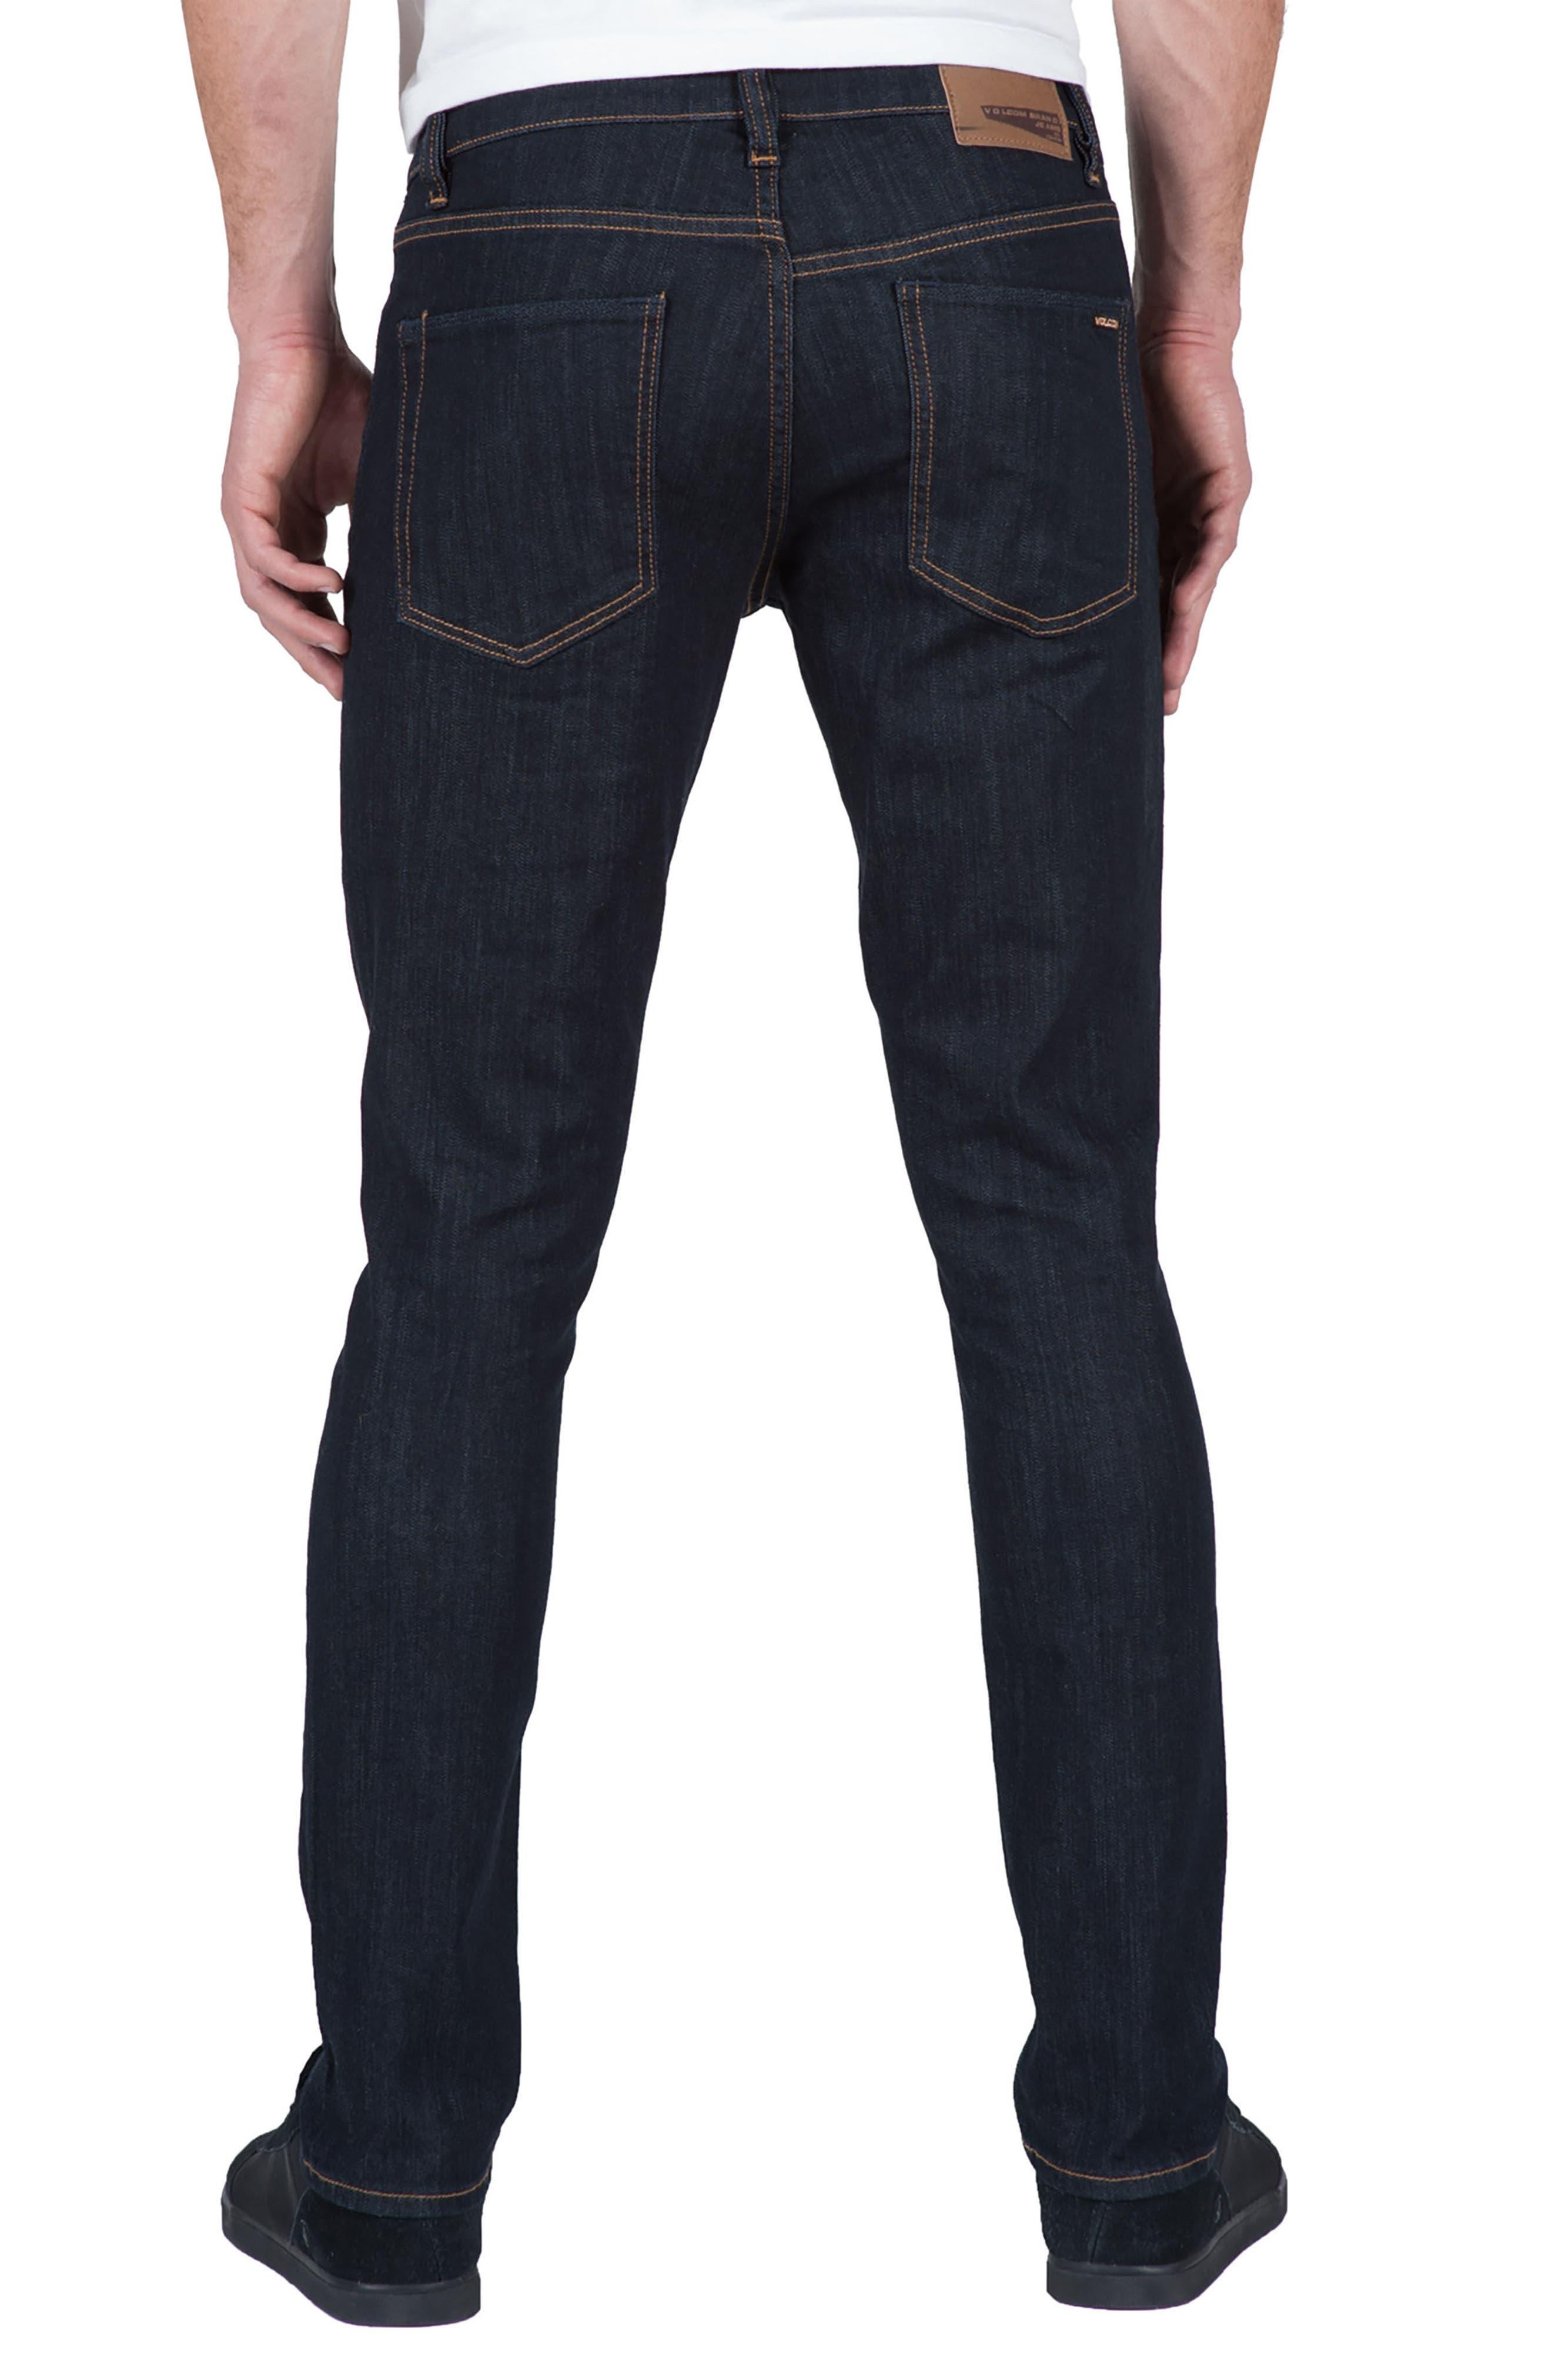 2x4 Slim Straight Leg Jeans,                             Alternate thumbnail 2, color,                             Blue Rinse